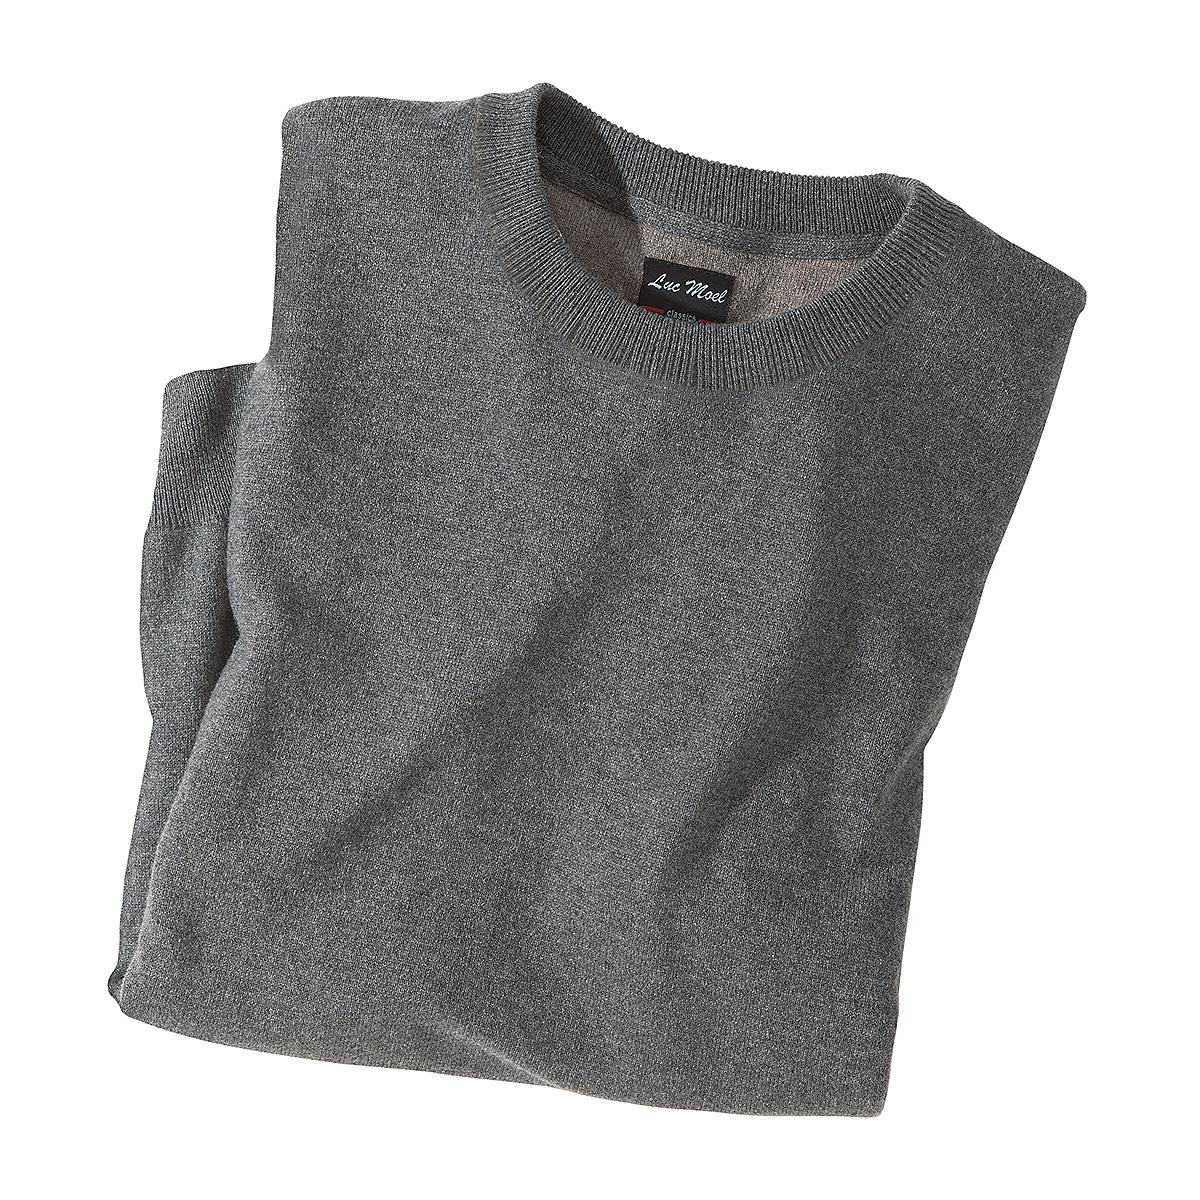 luc moel kaschmir pullover farbe grau gr enspezialist m nnermode. Black Bedroom Furniture Sets. Home Design Ideas